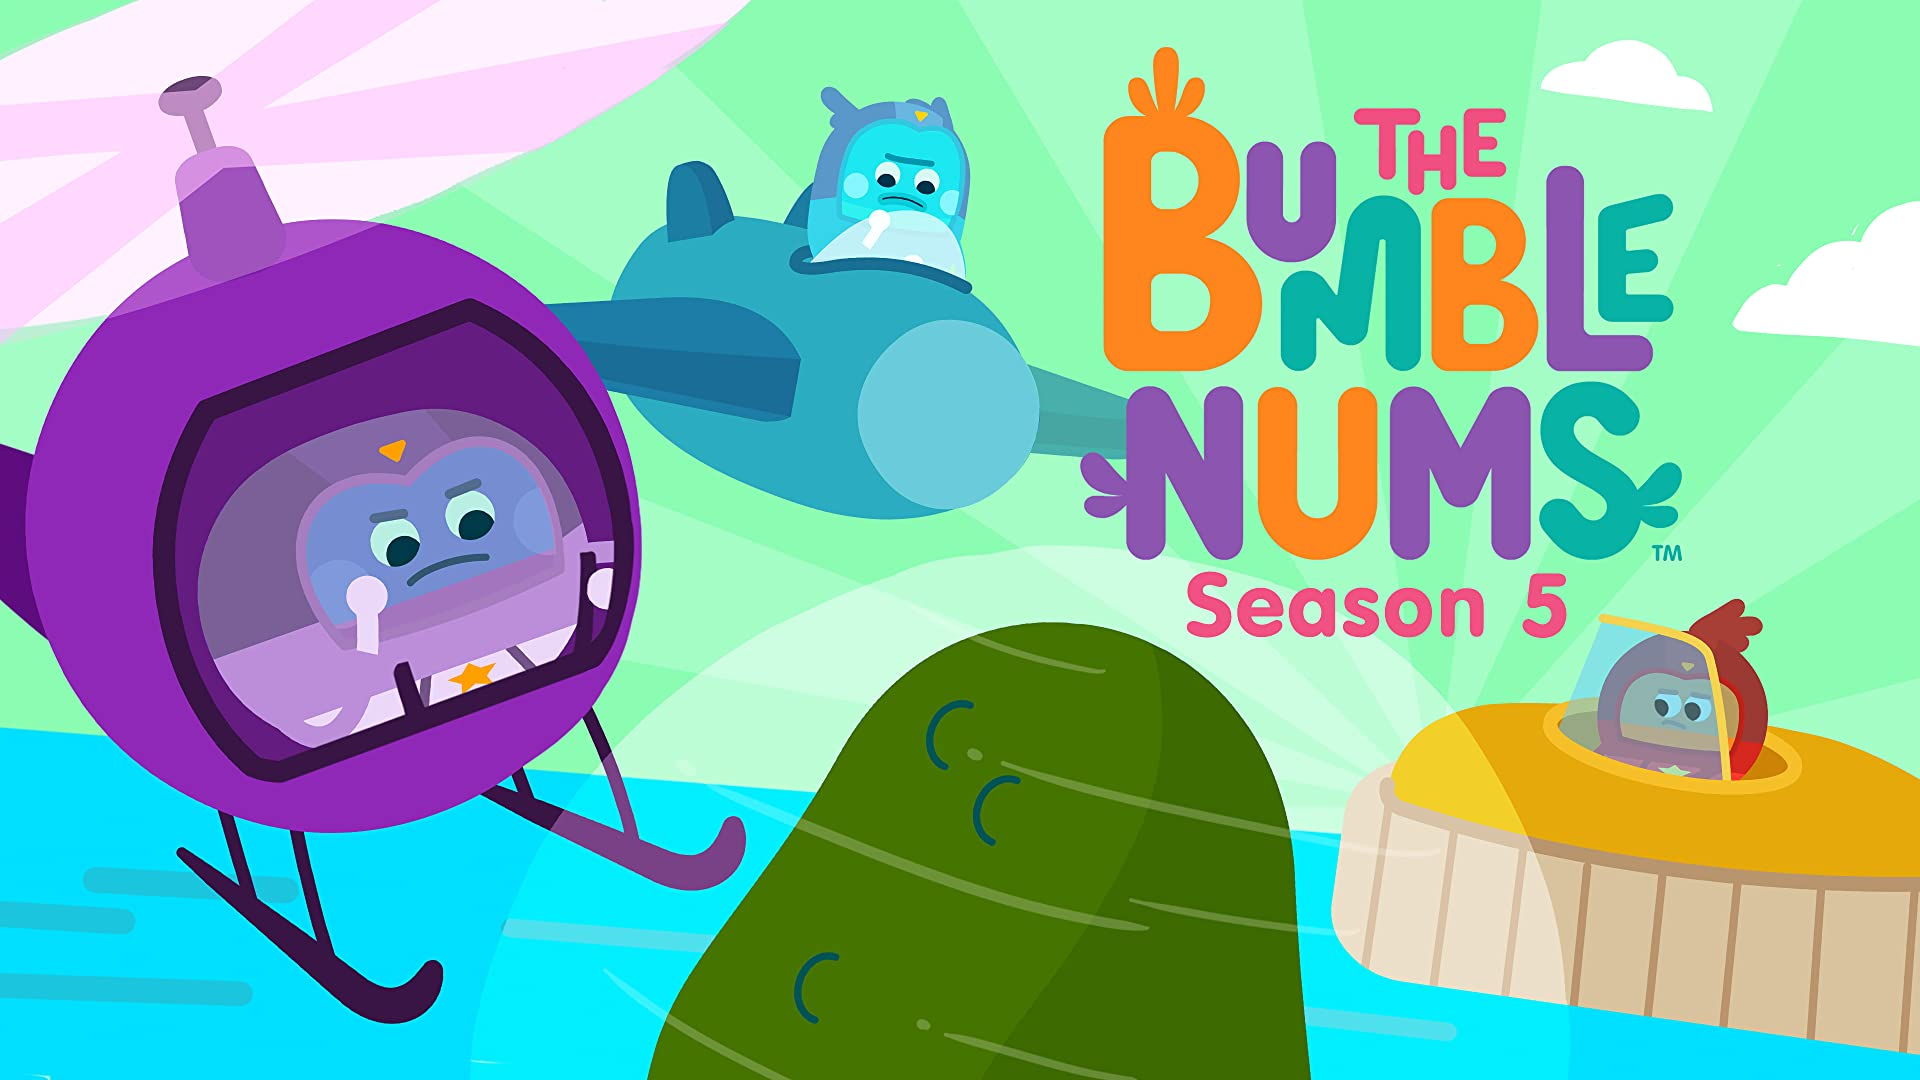 The Bumble Nums - Season 5